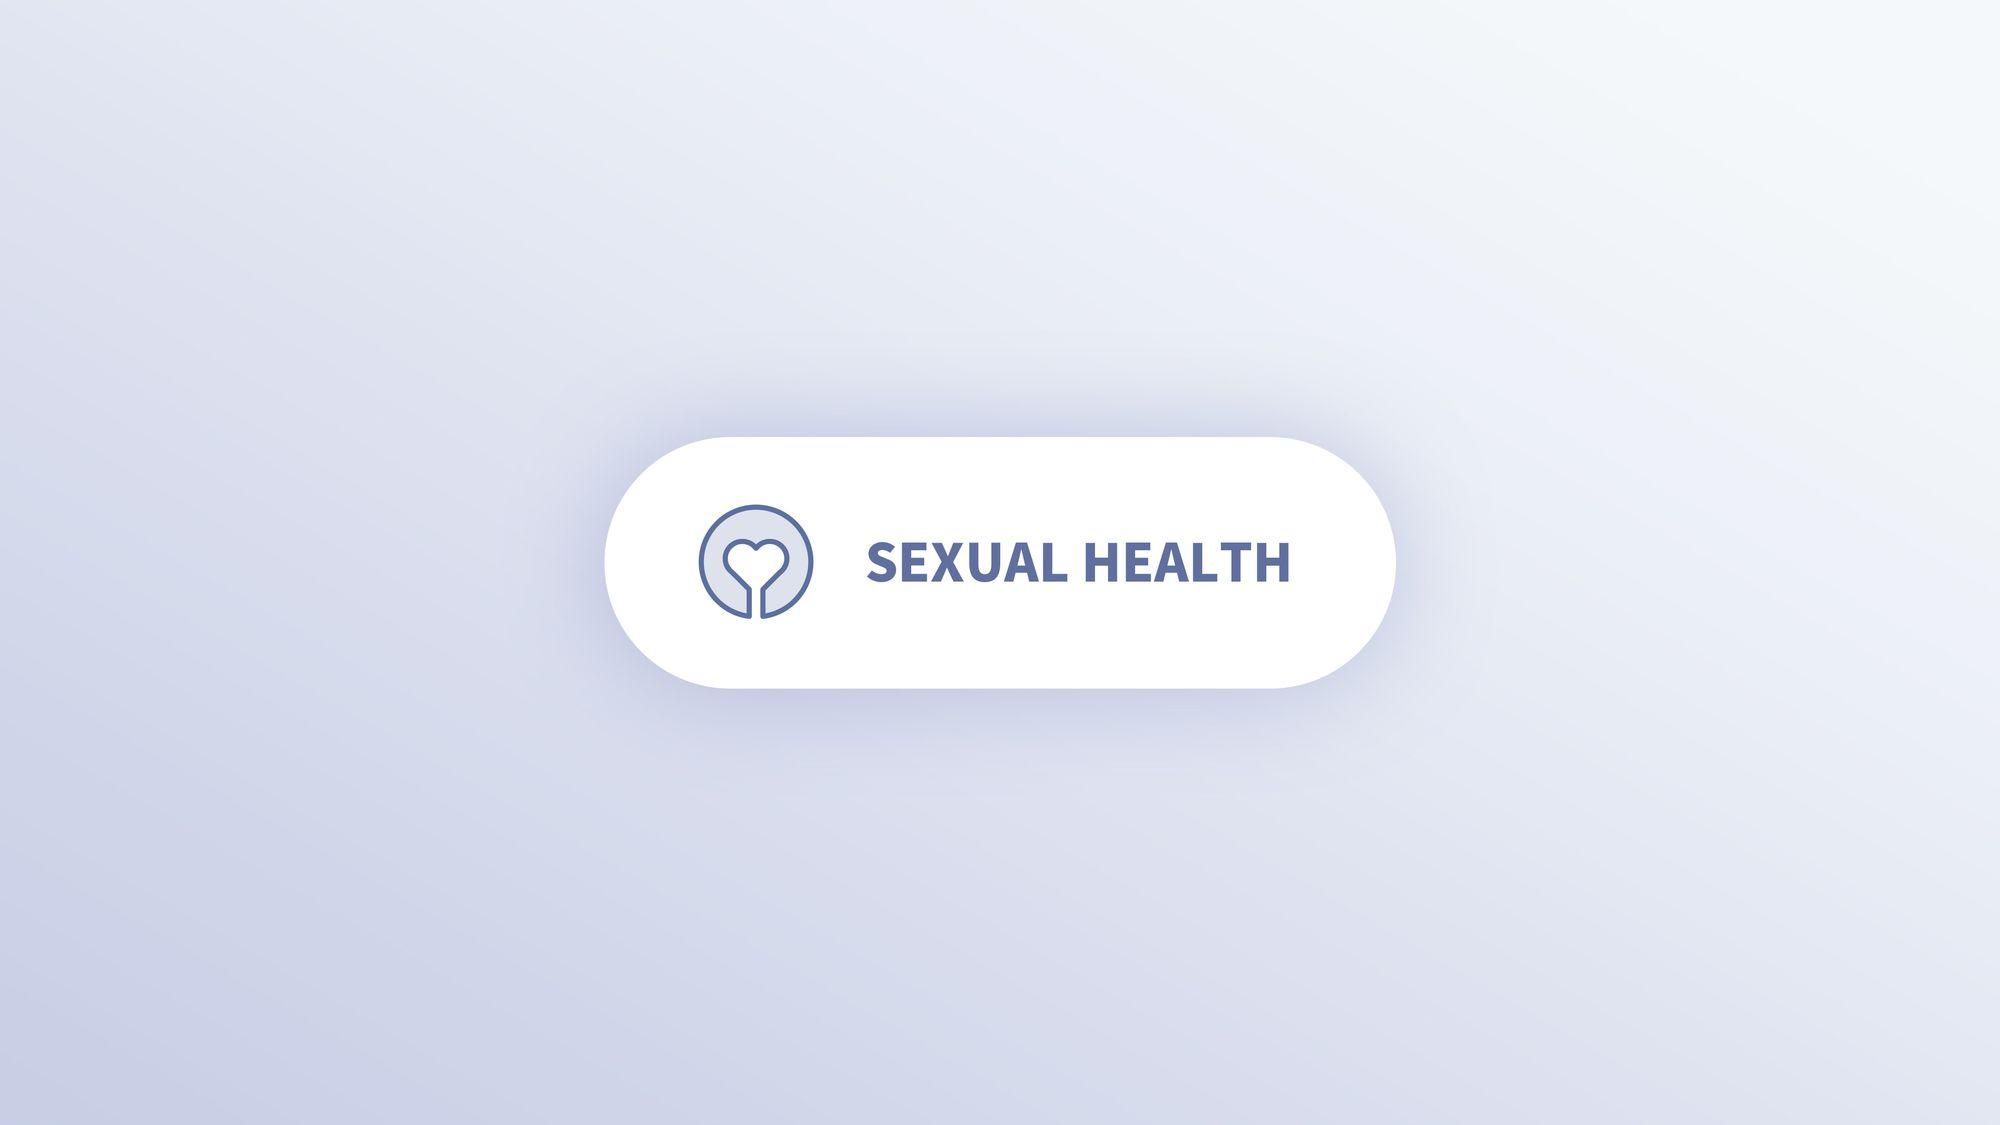 Sexual_Health_Icon  6